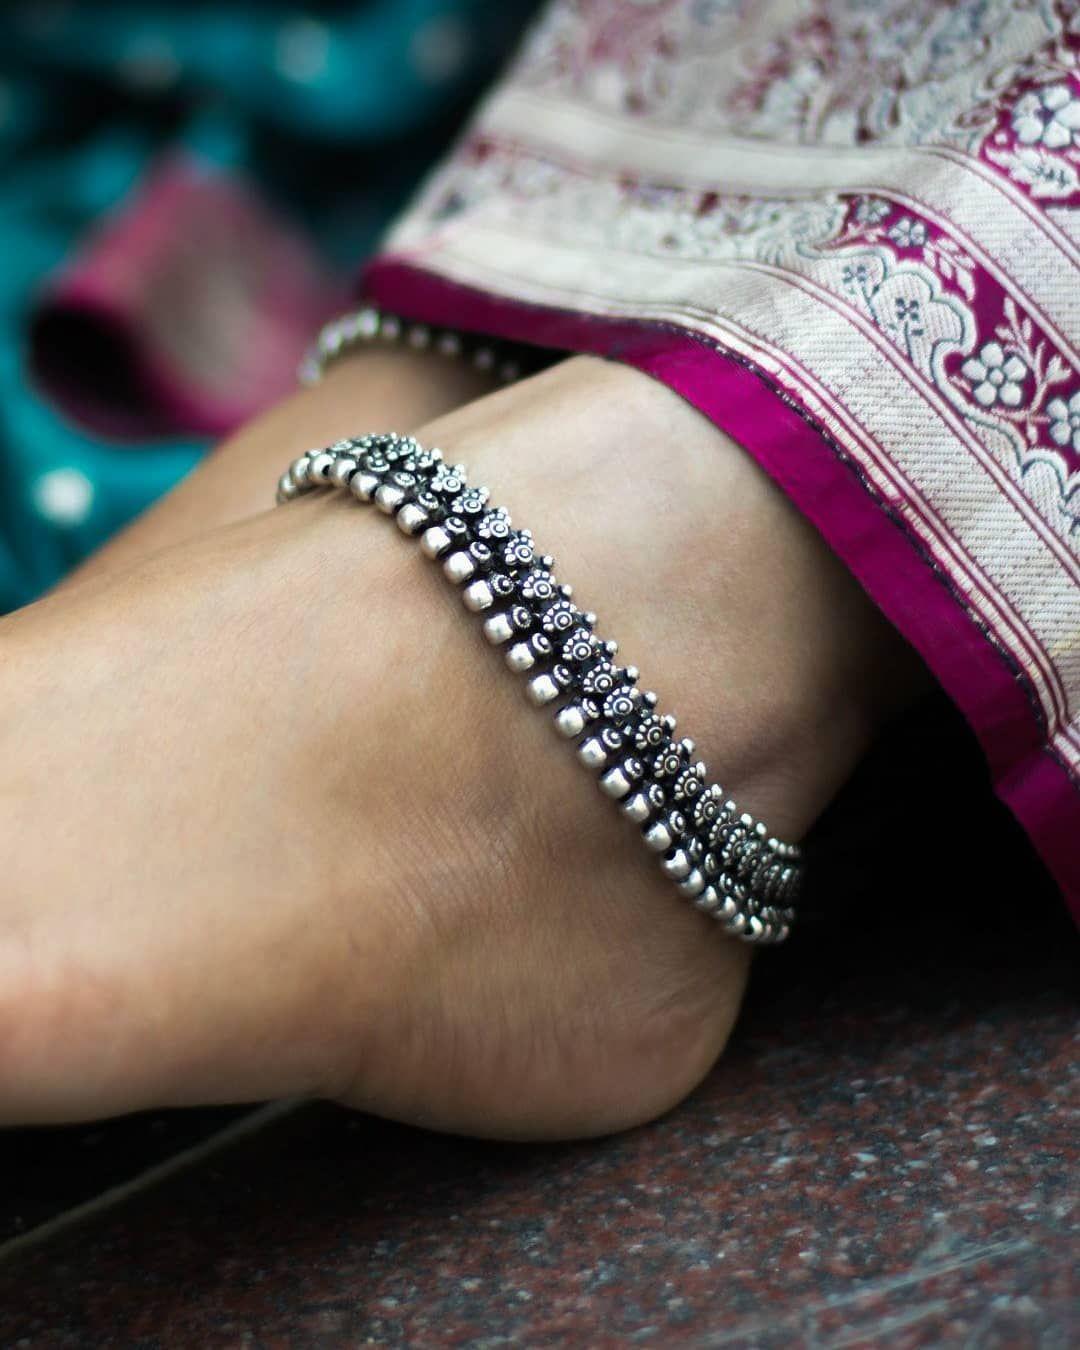 German Silver Oxidised Anklets